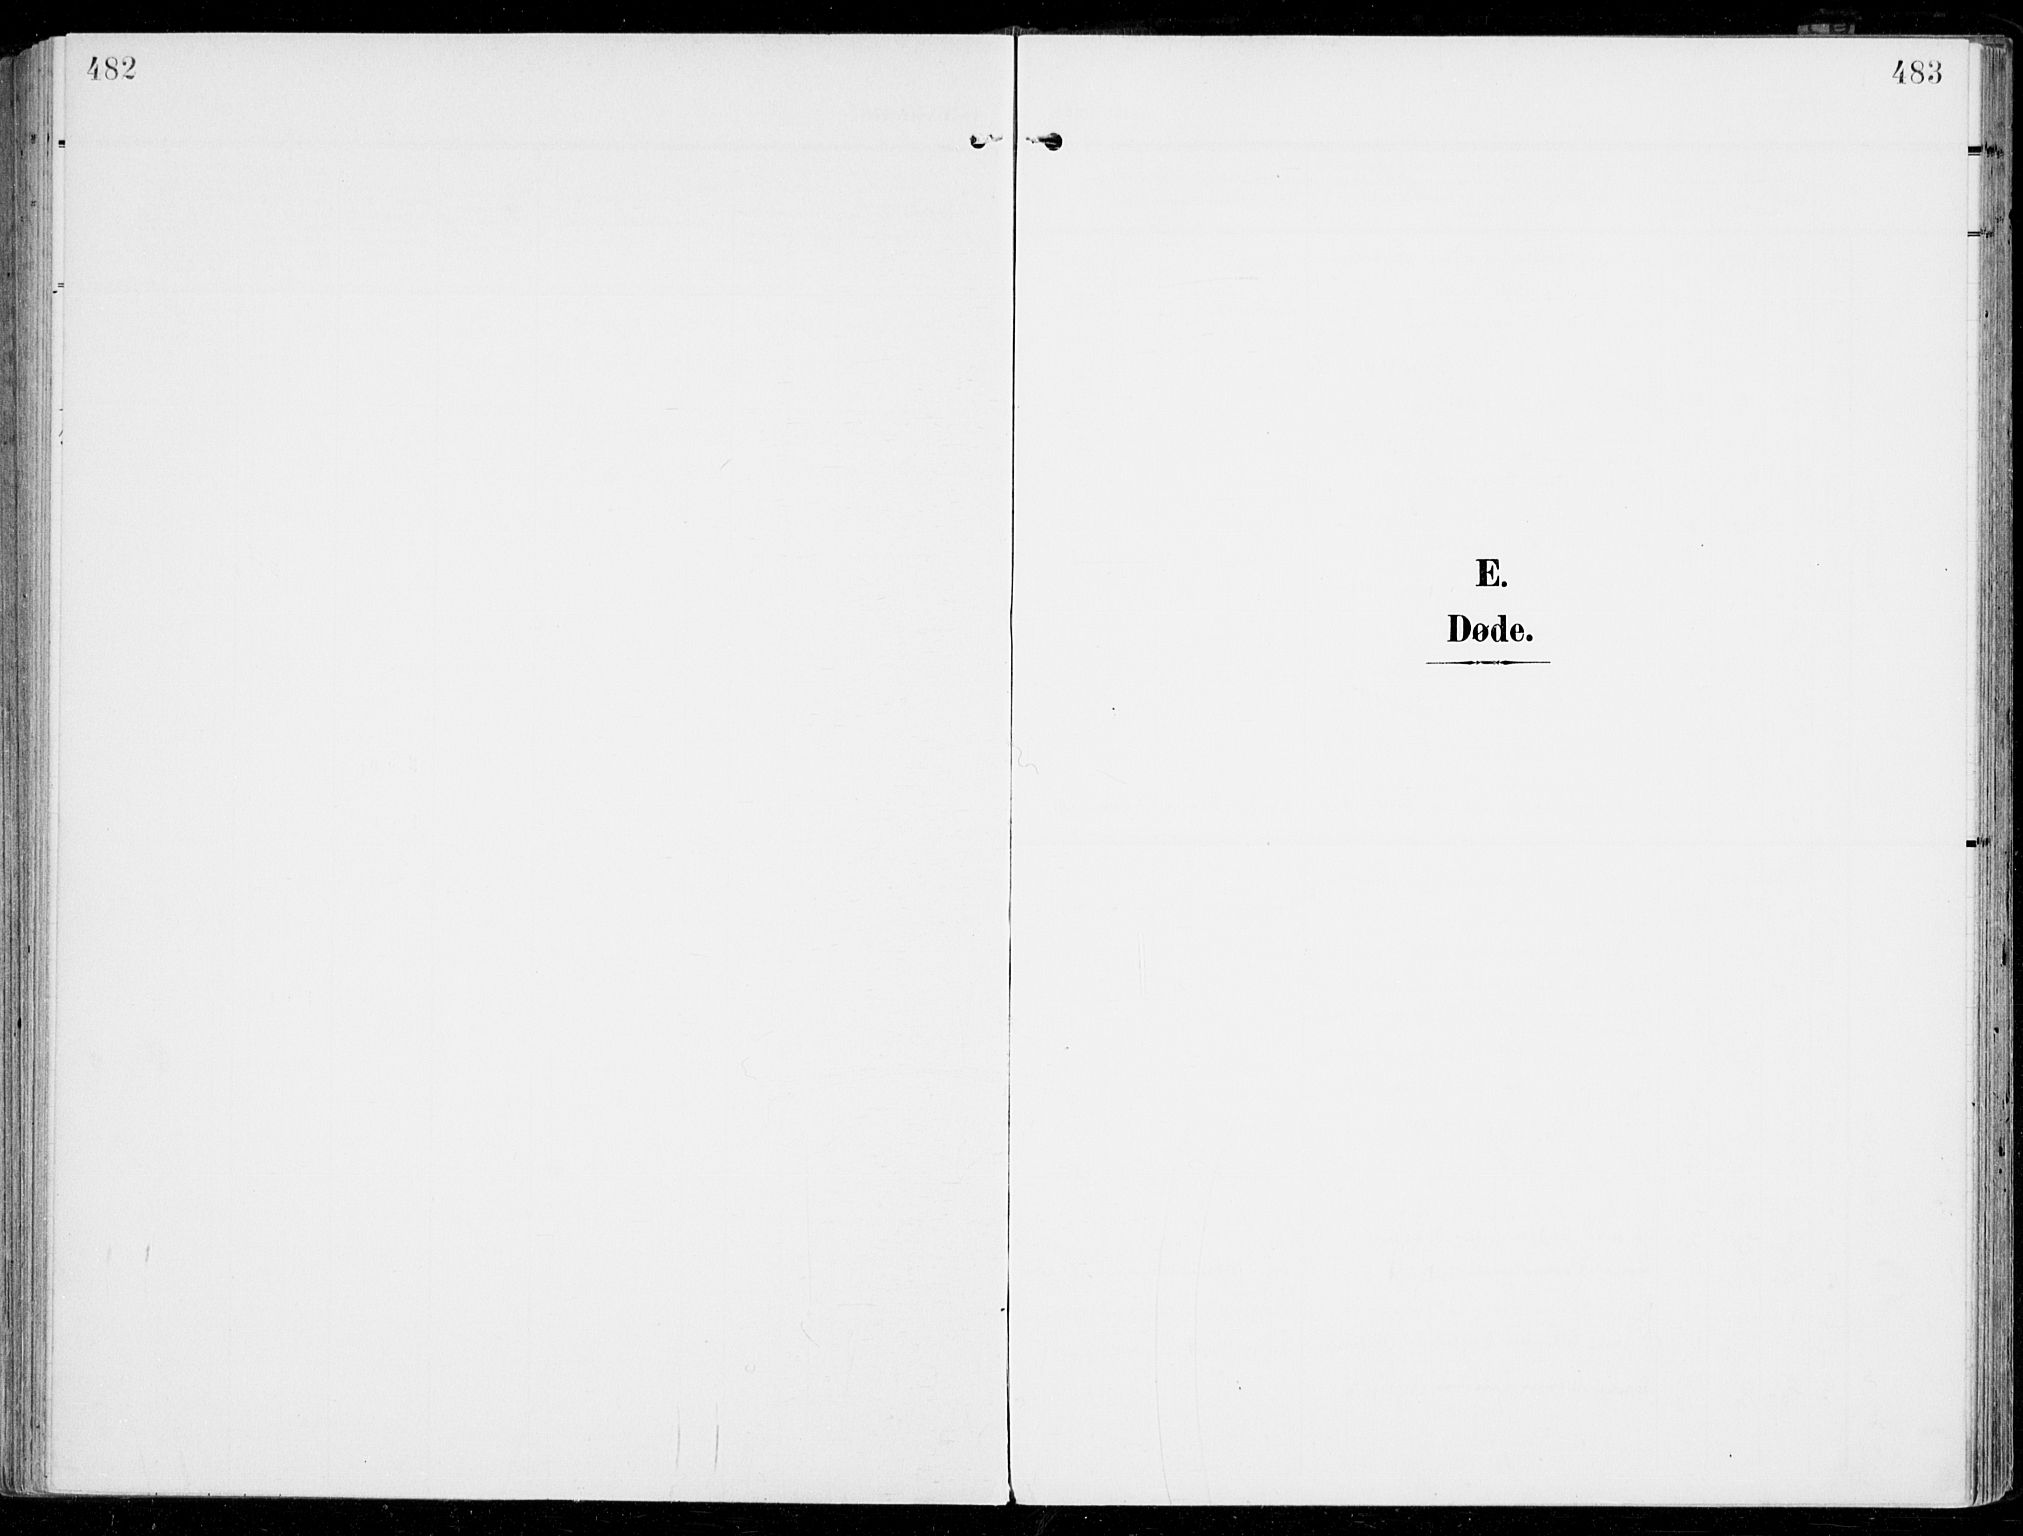 SAKO, Sem kirkebøker, F/Fb/L0006: Ministerialbok nr. II 6, 1905-1918, s. 482-483